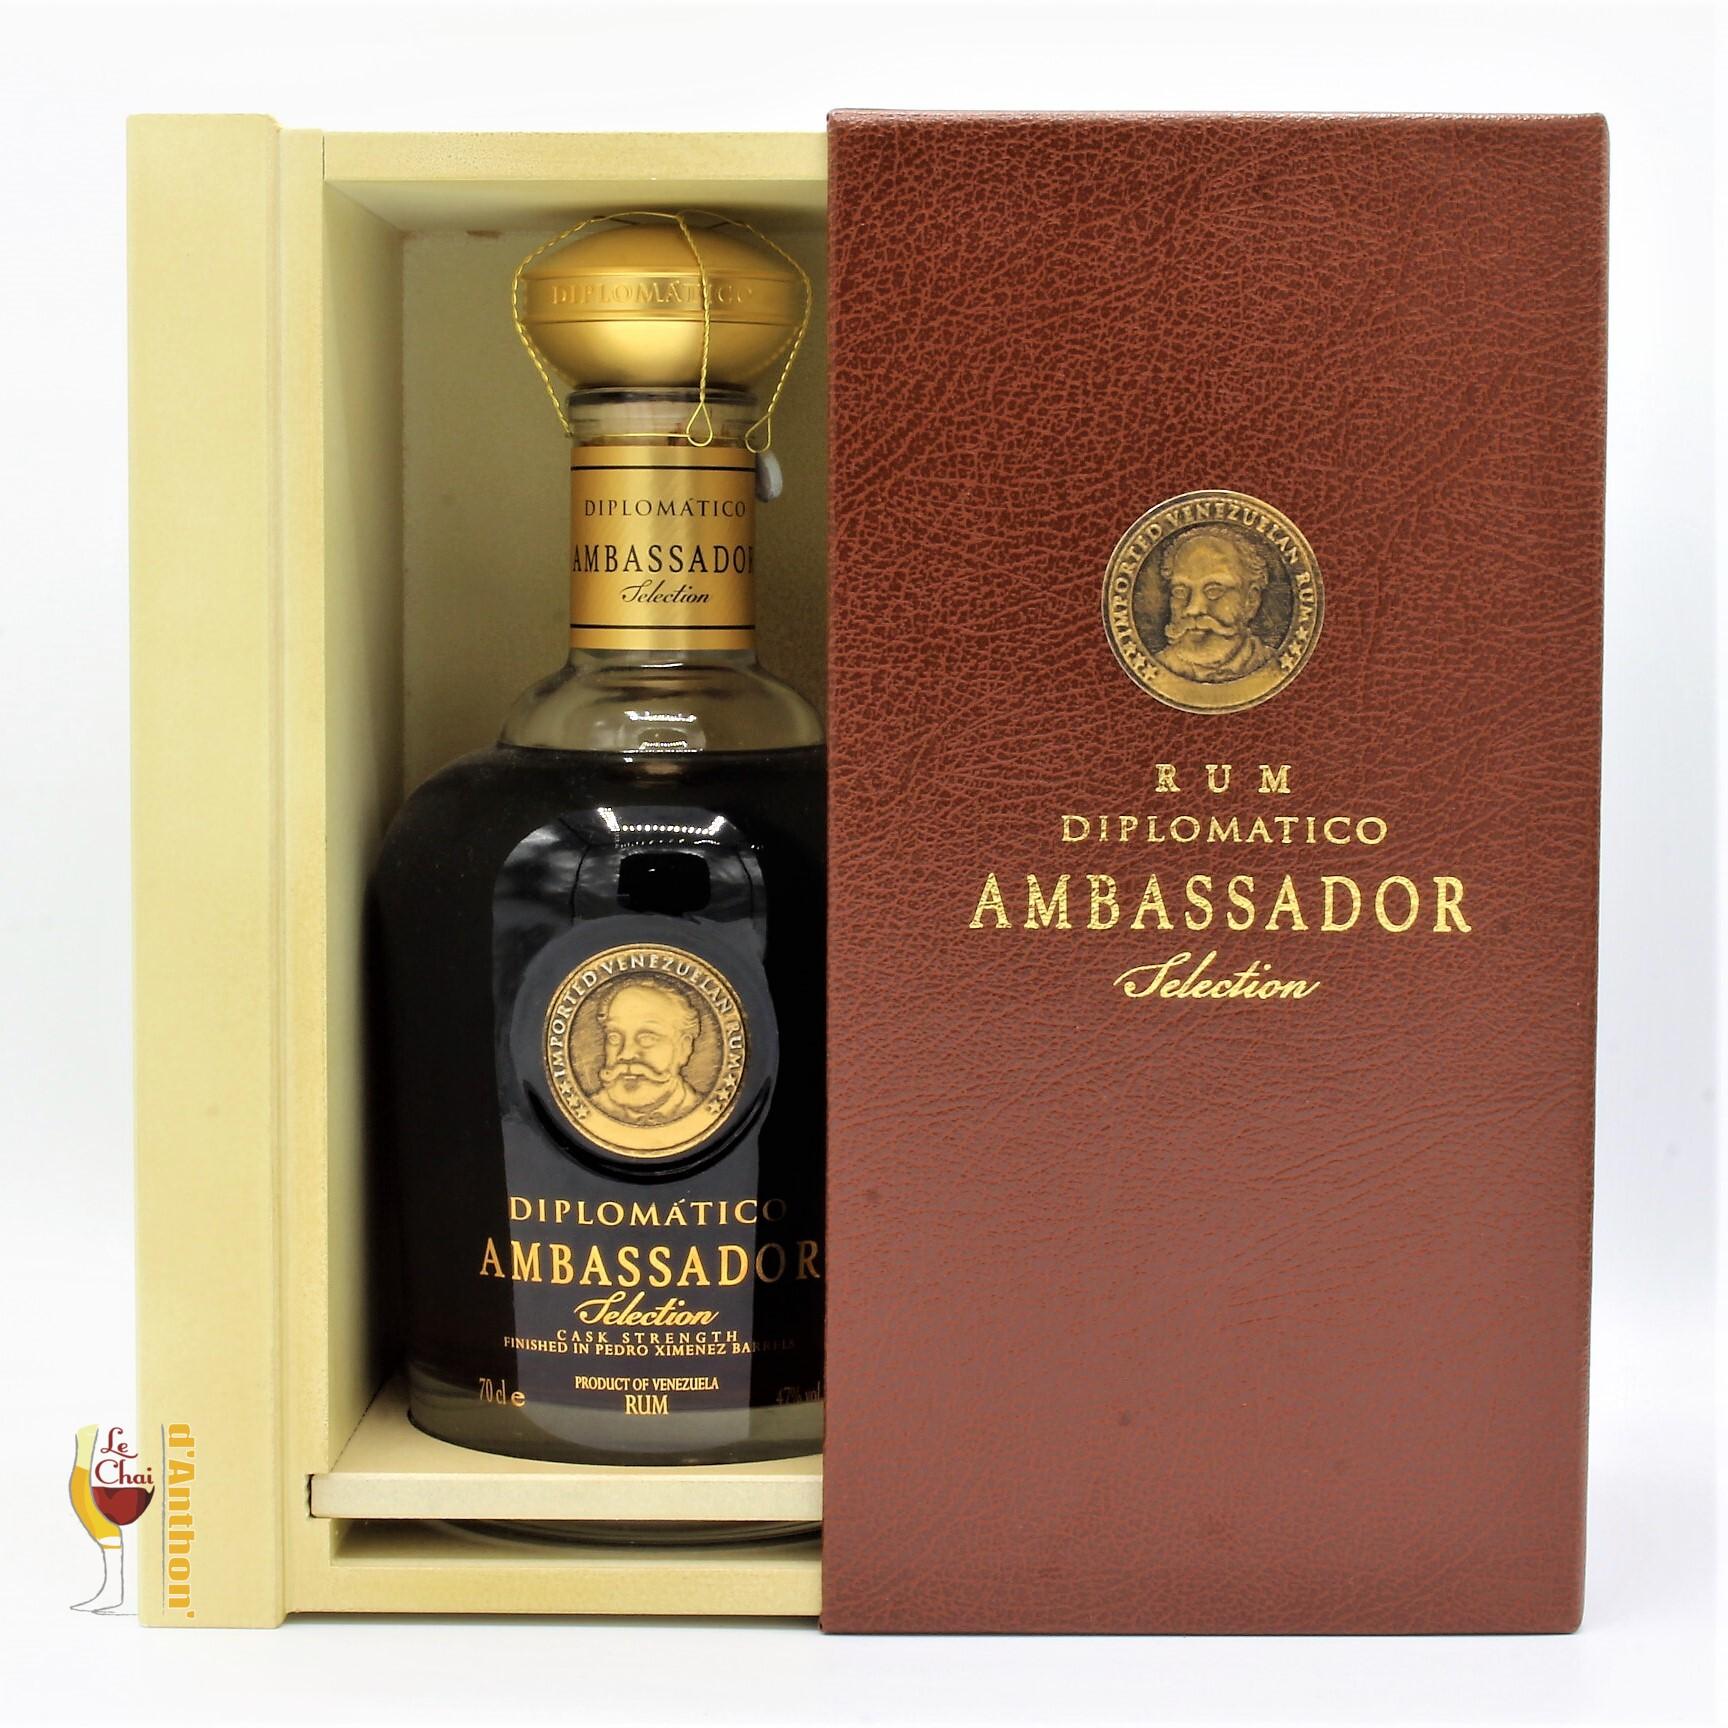 Le Chai D&939.JPG039;Anthon Spiritueux Rhum Ambre Melasse Venezuela Diplomatico Ambassador 70cl 939